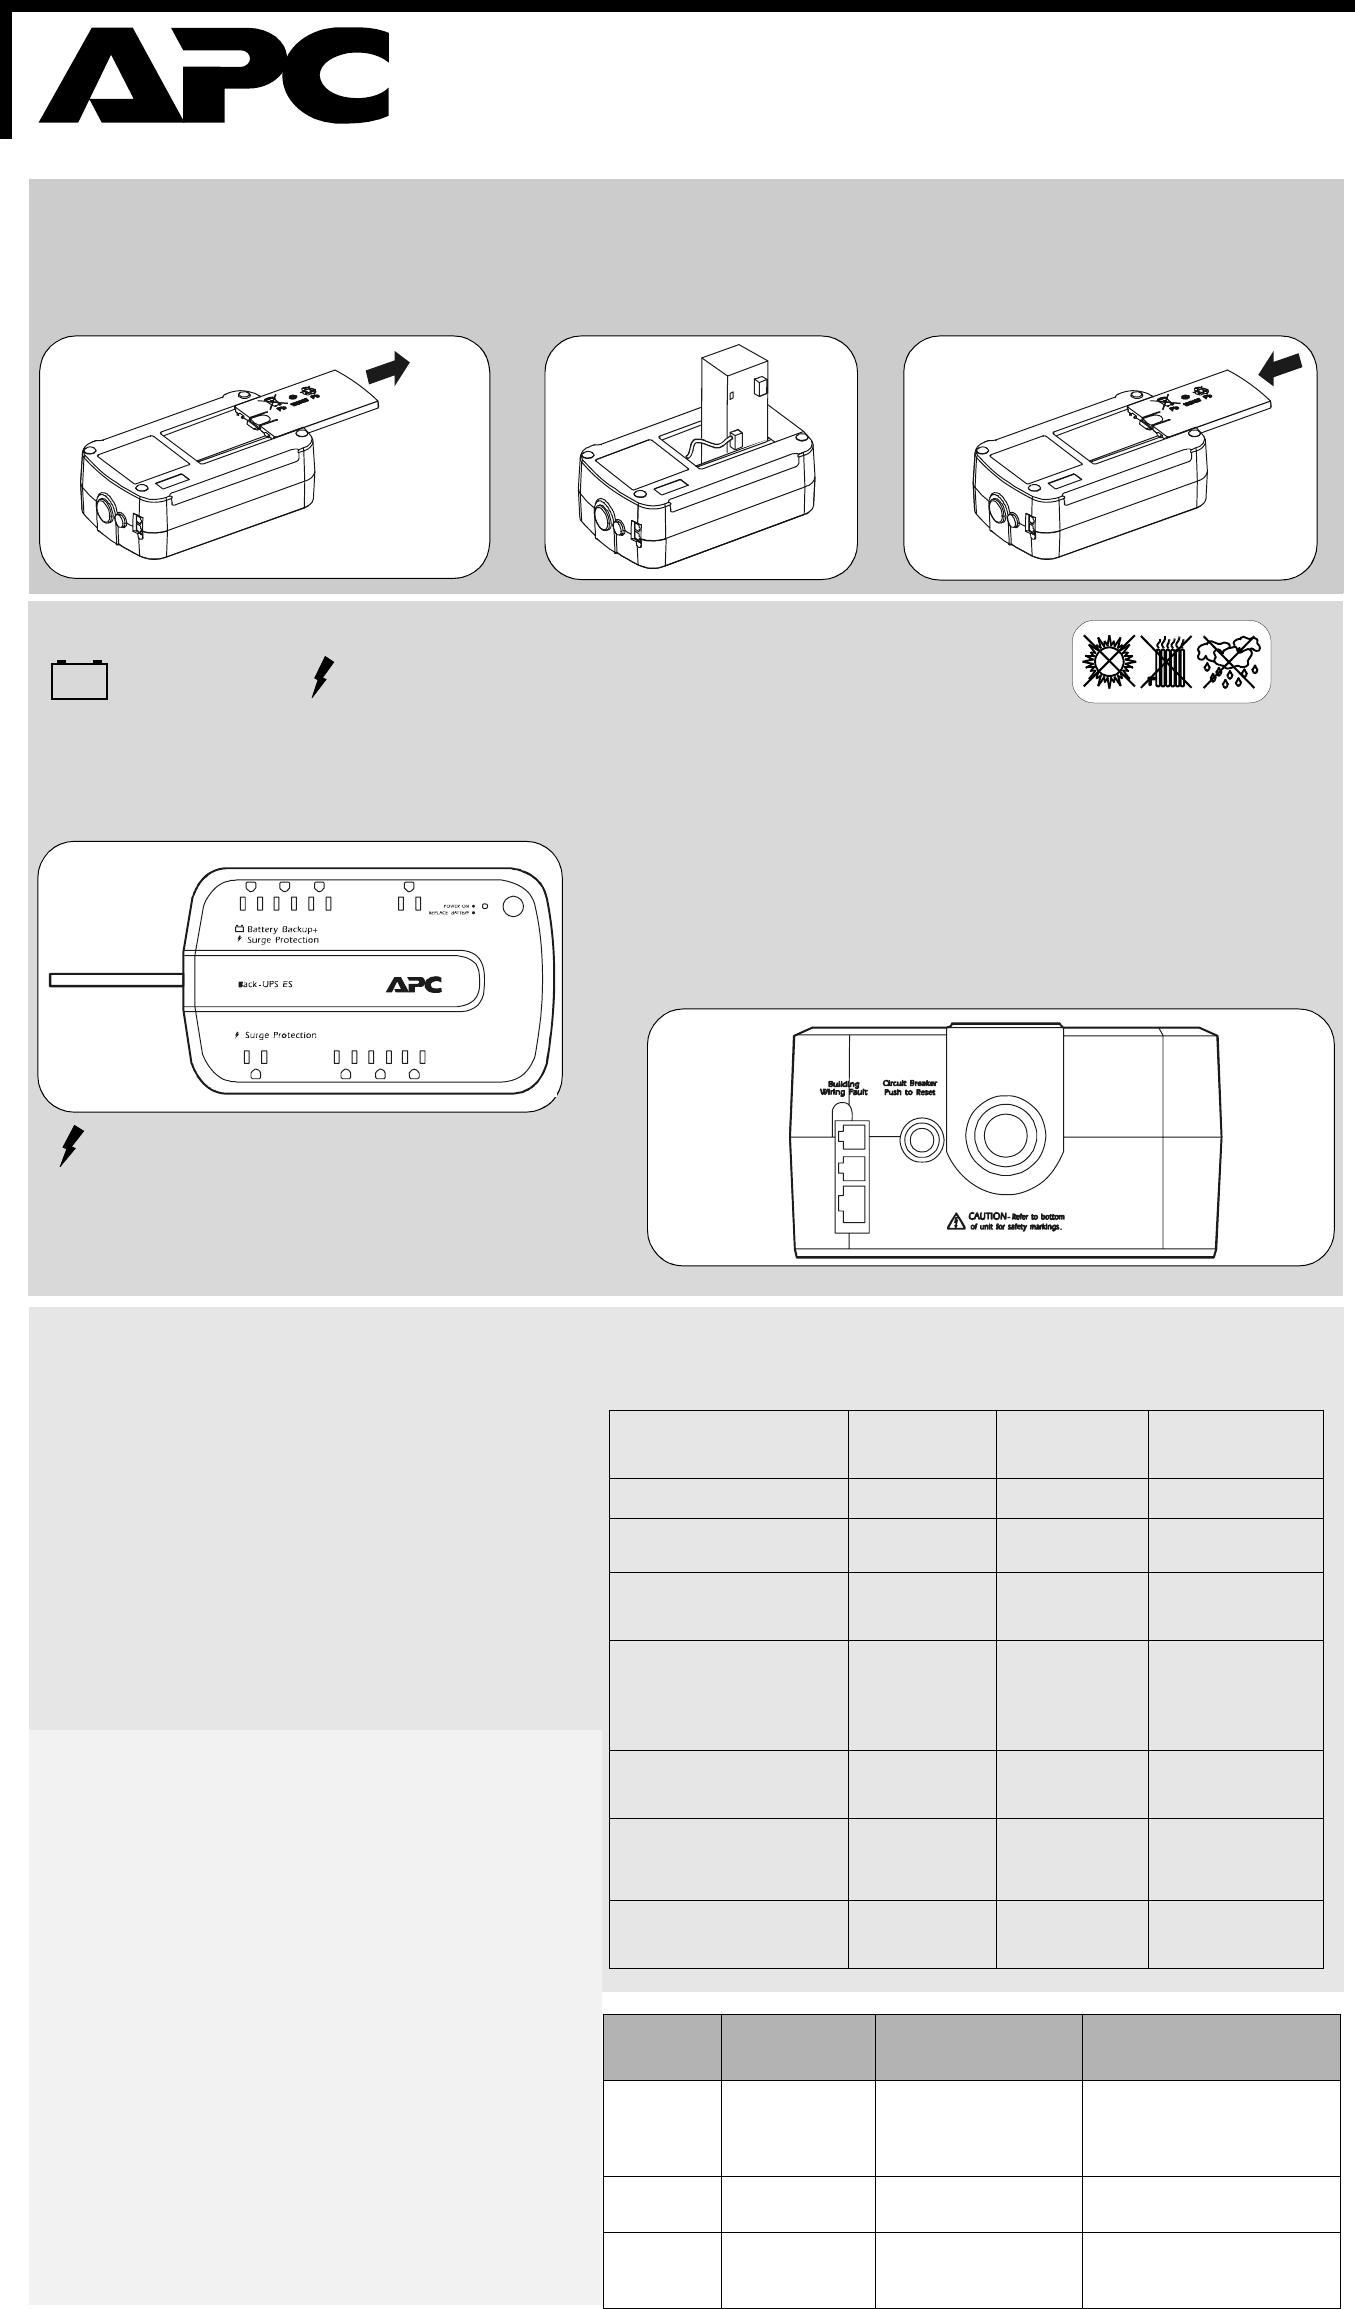 APC BE450G-LM manual